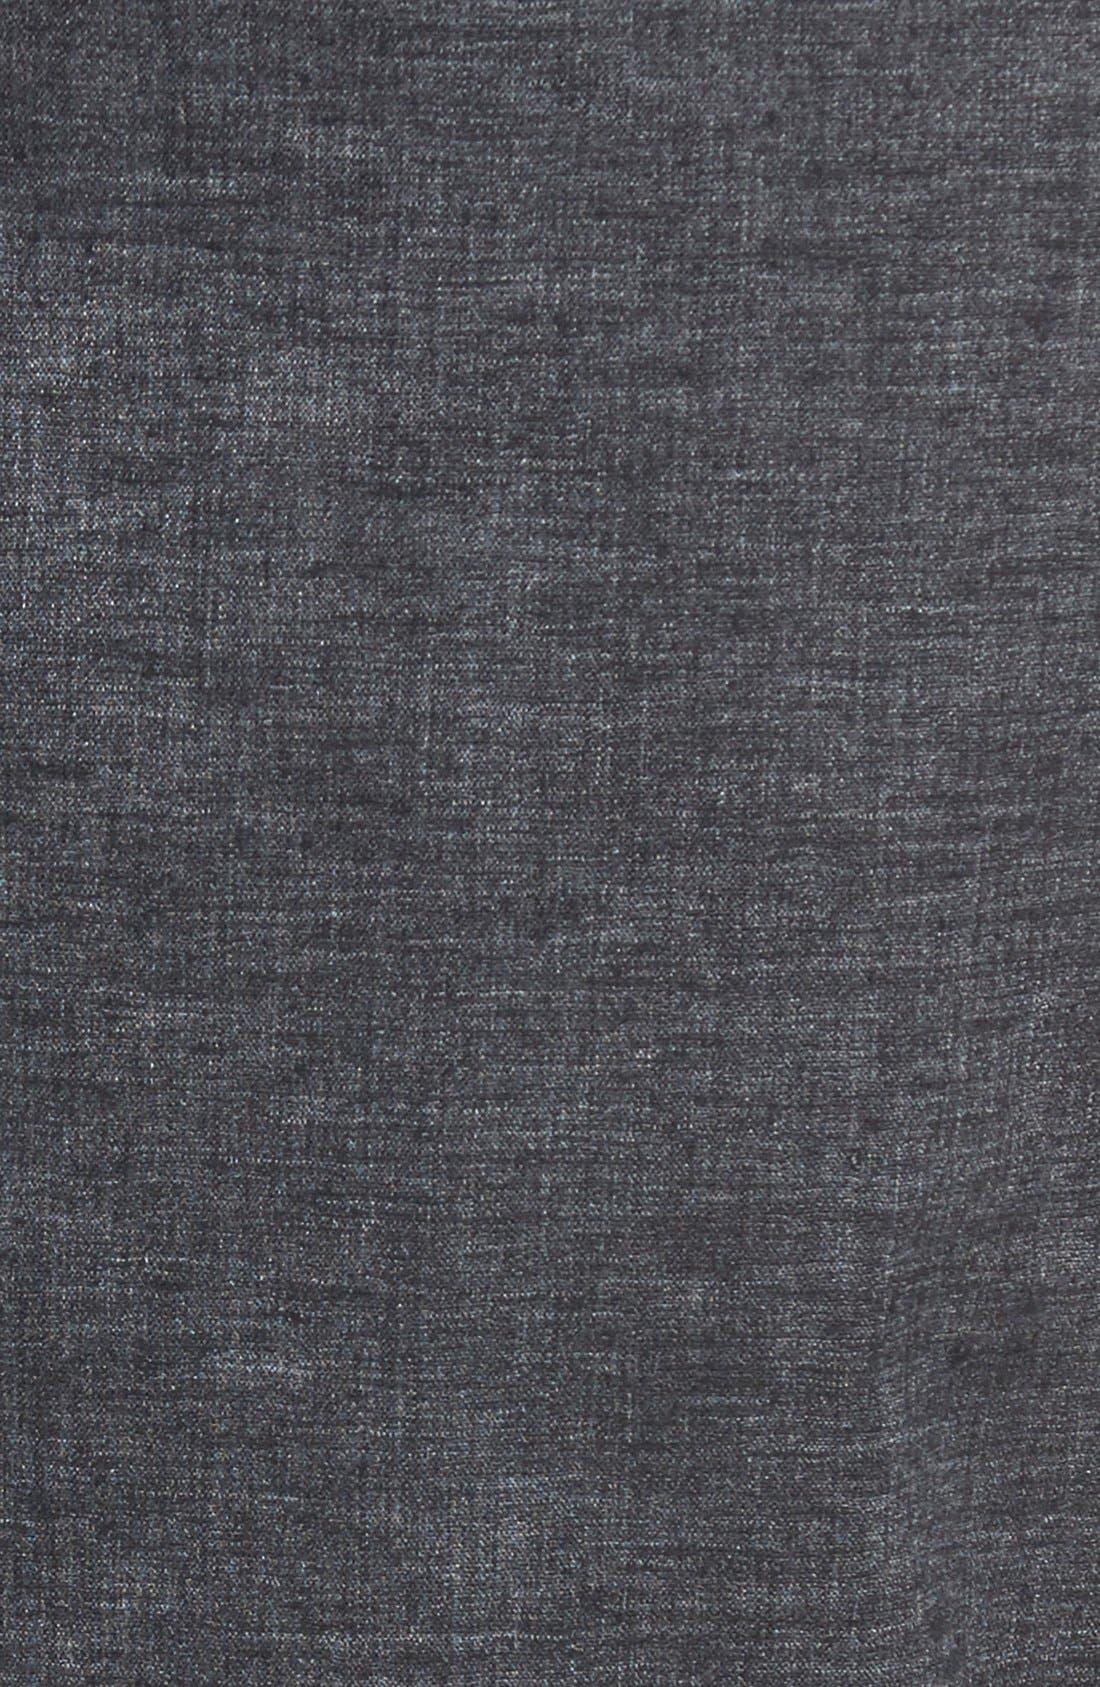 Vaha Pants,                             Alternate thumbnail 5, color,                             Black